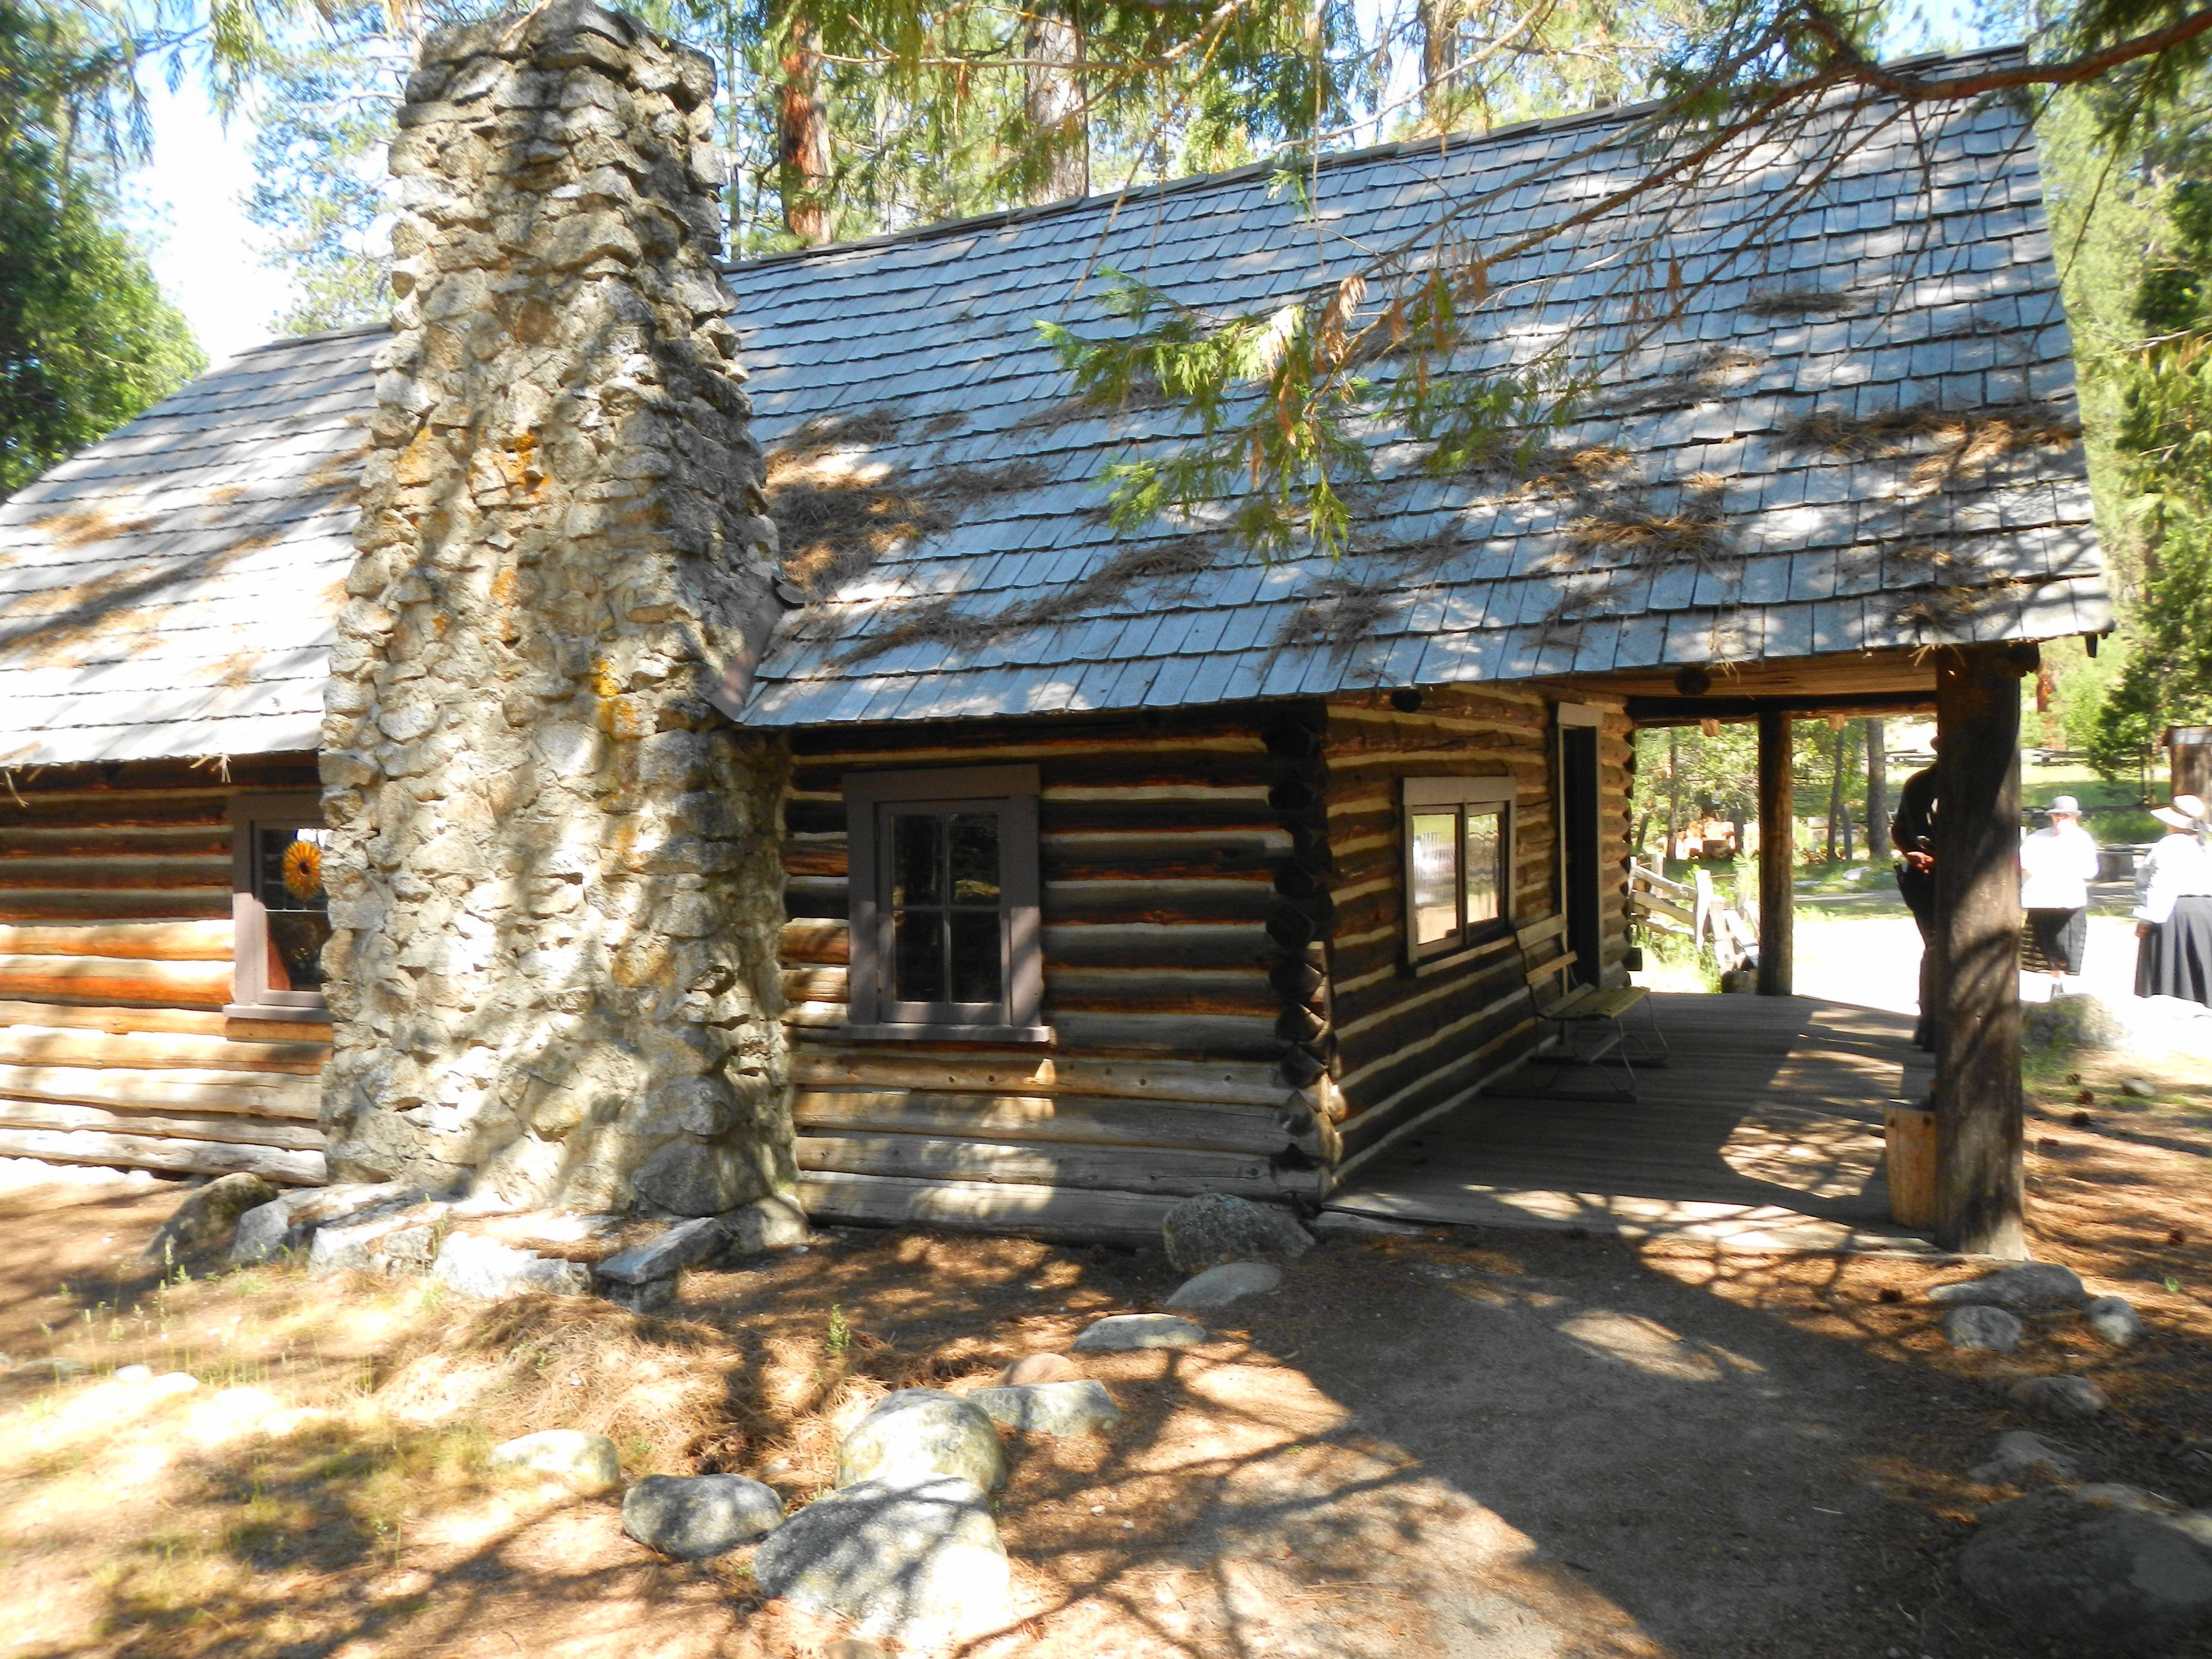 hostelling reviews mountain california wanderlove rustic cabins yosemite resort bug international